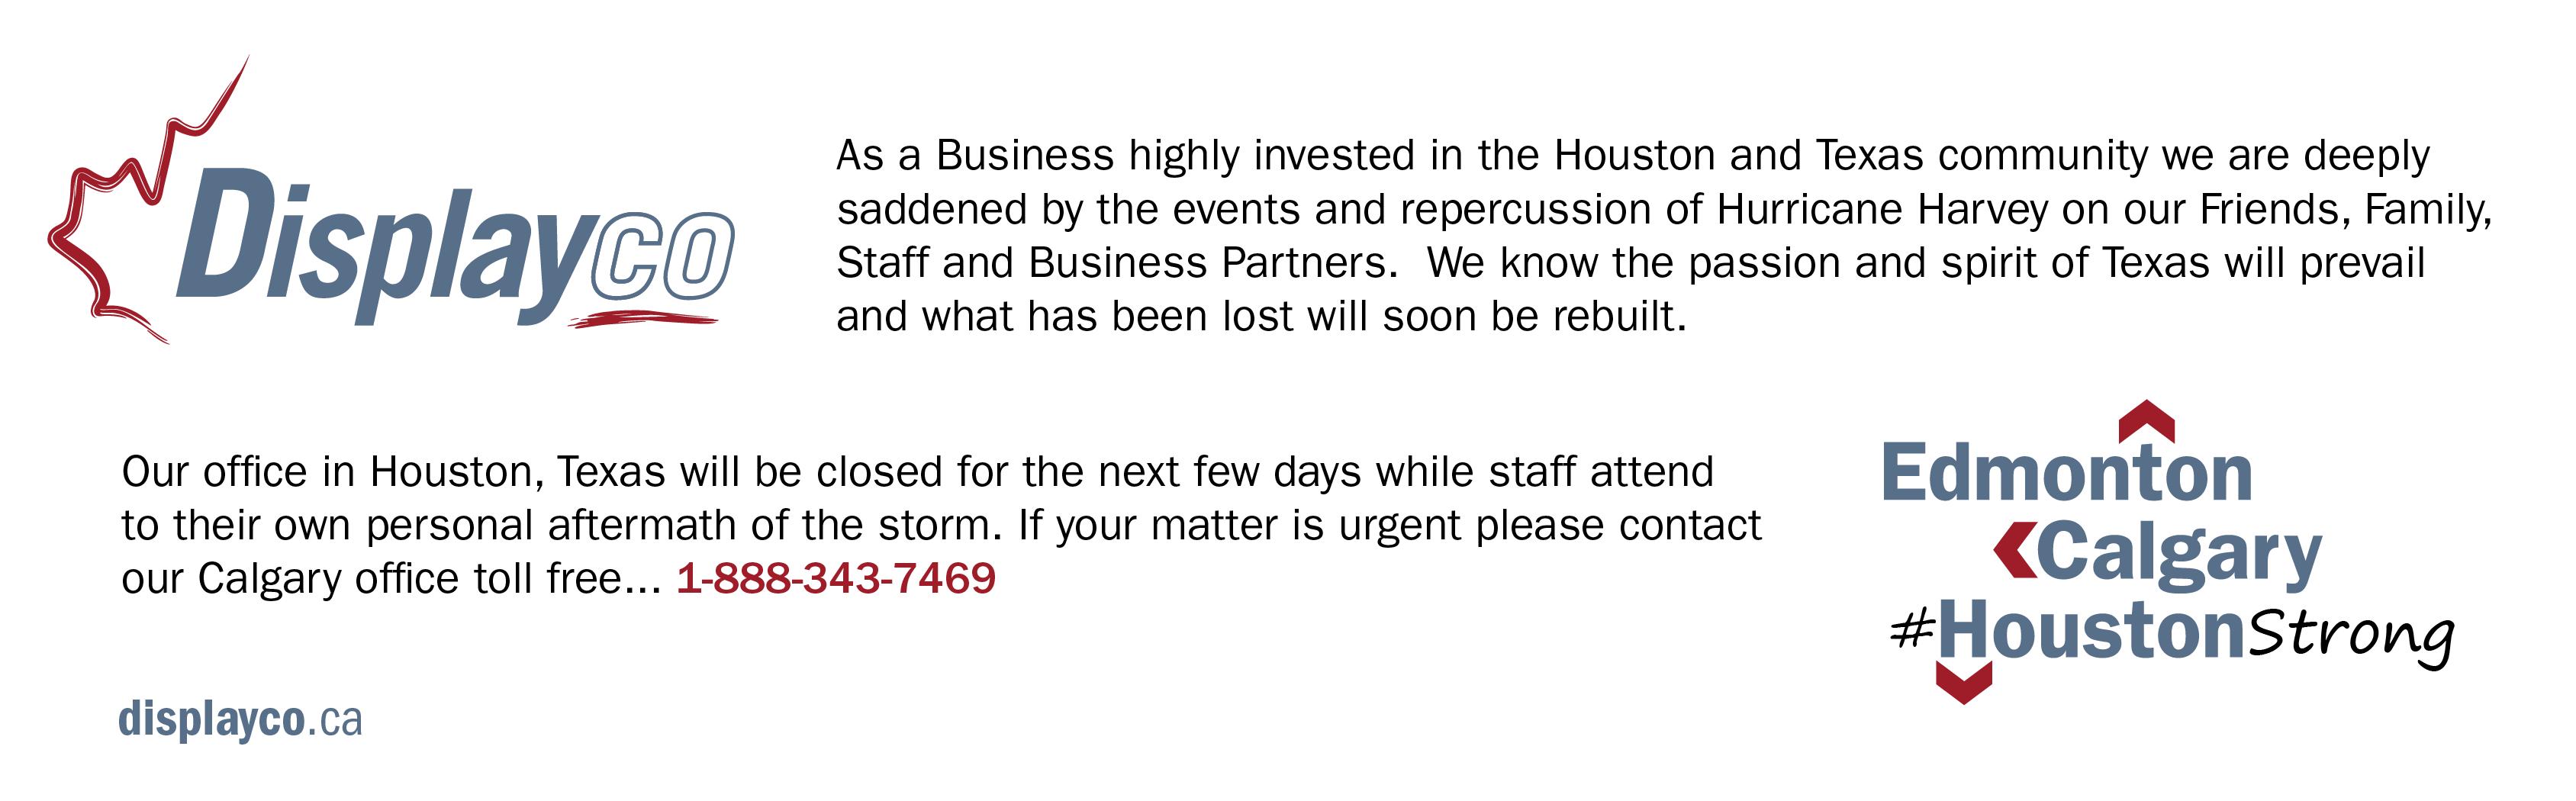 Displayco - Houston Hurricane Harvey